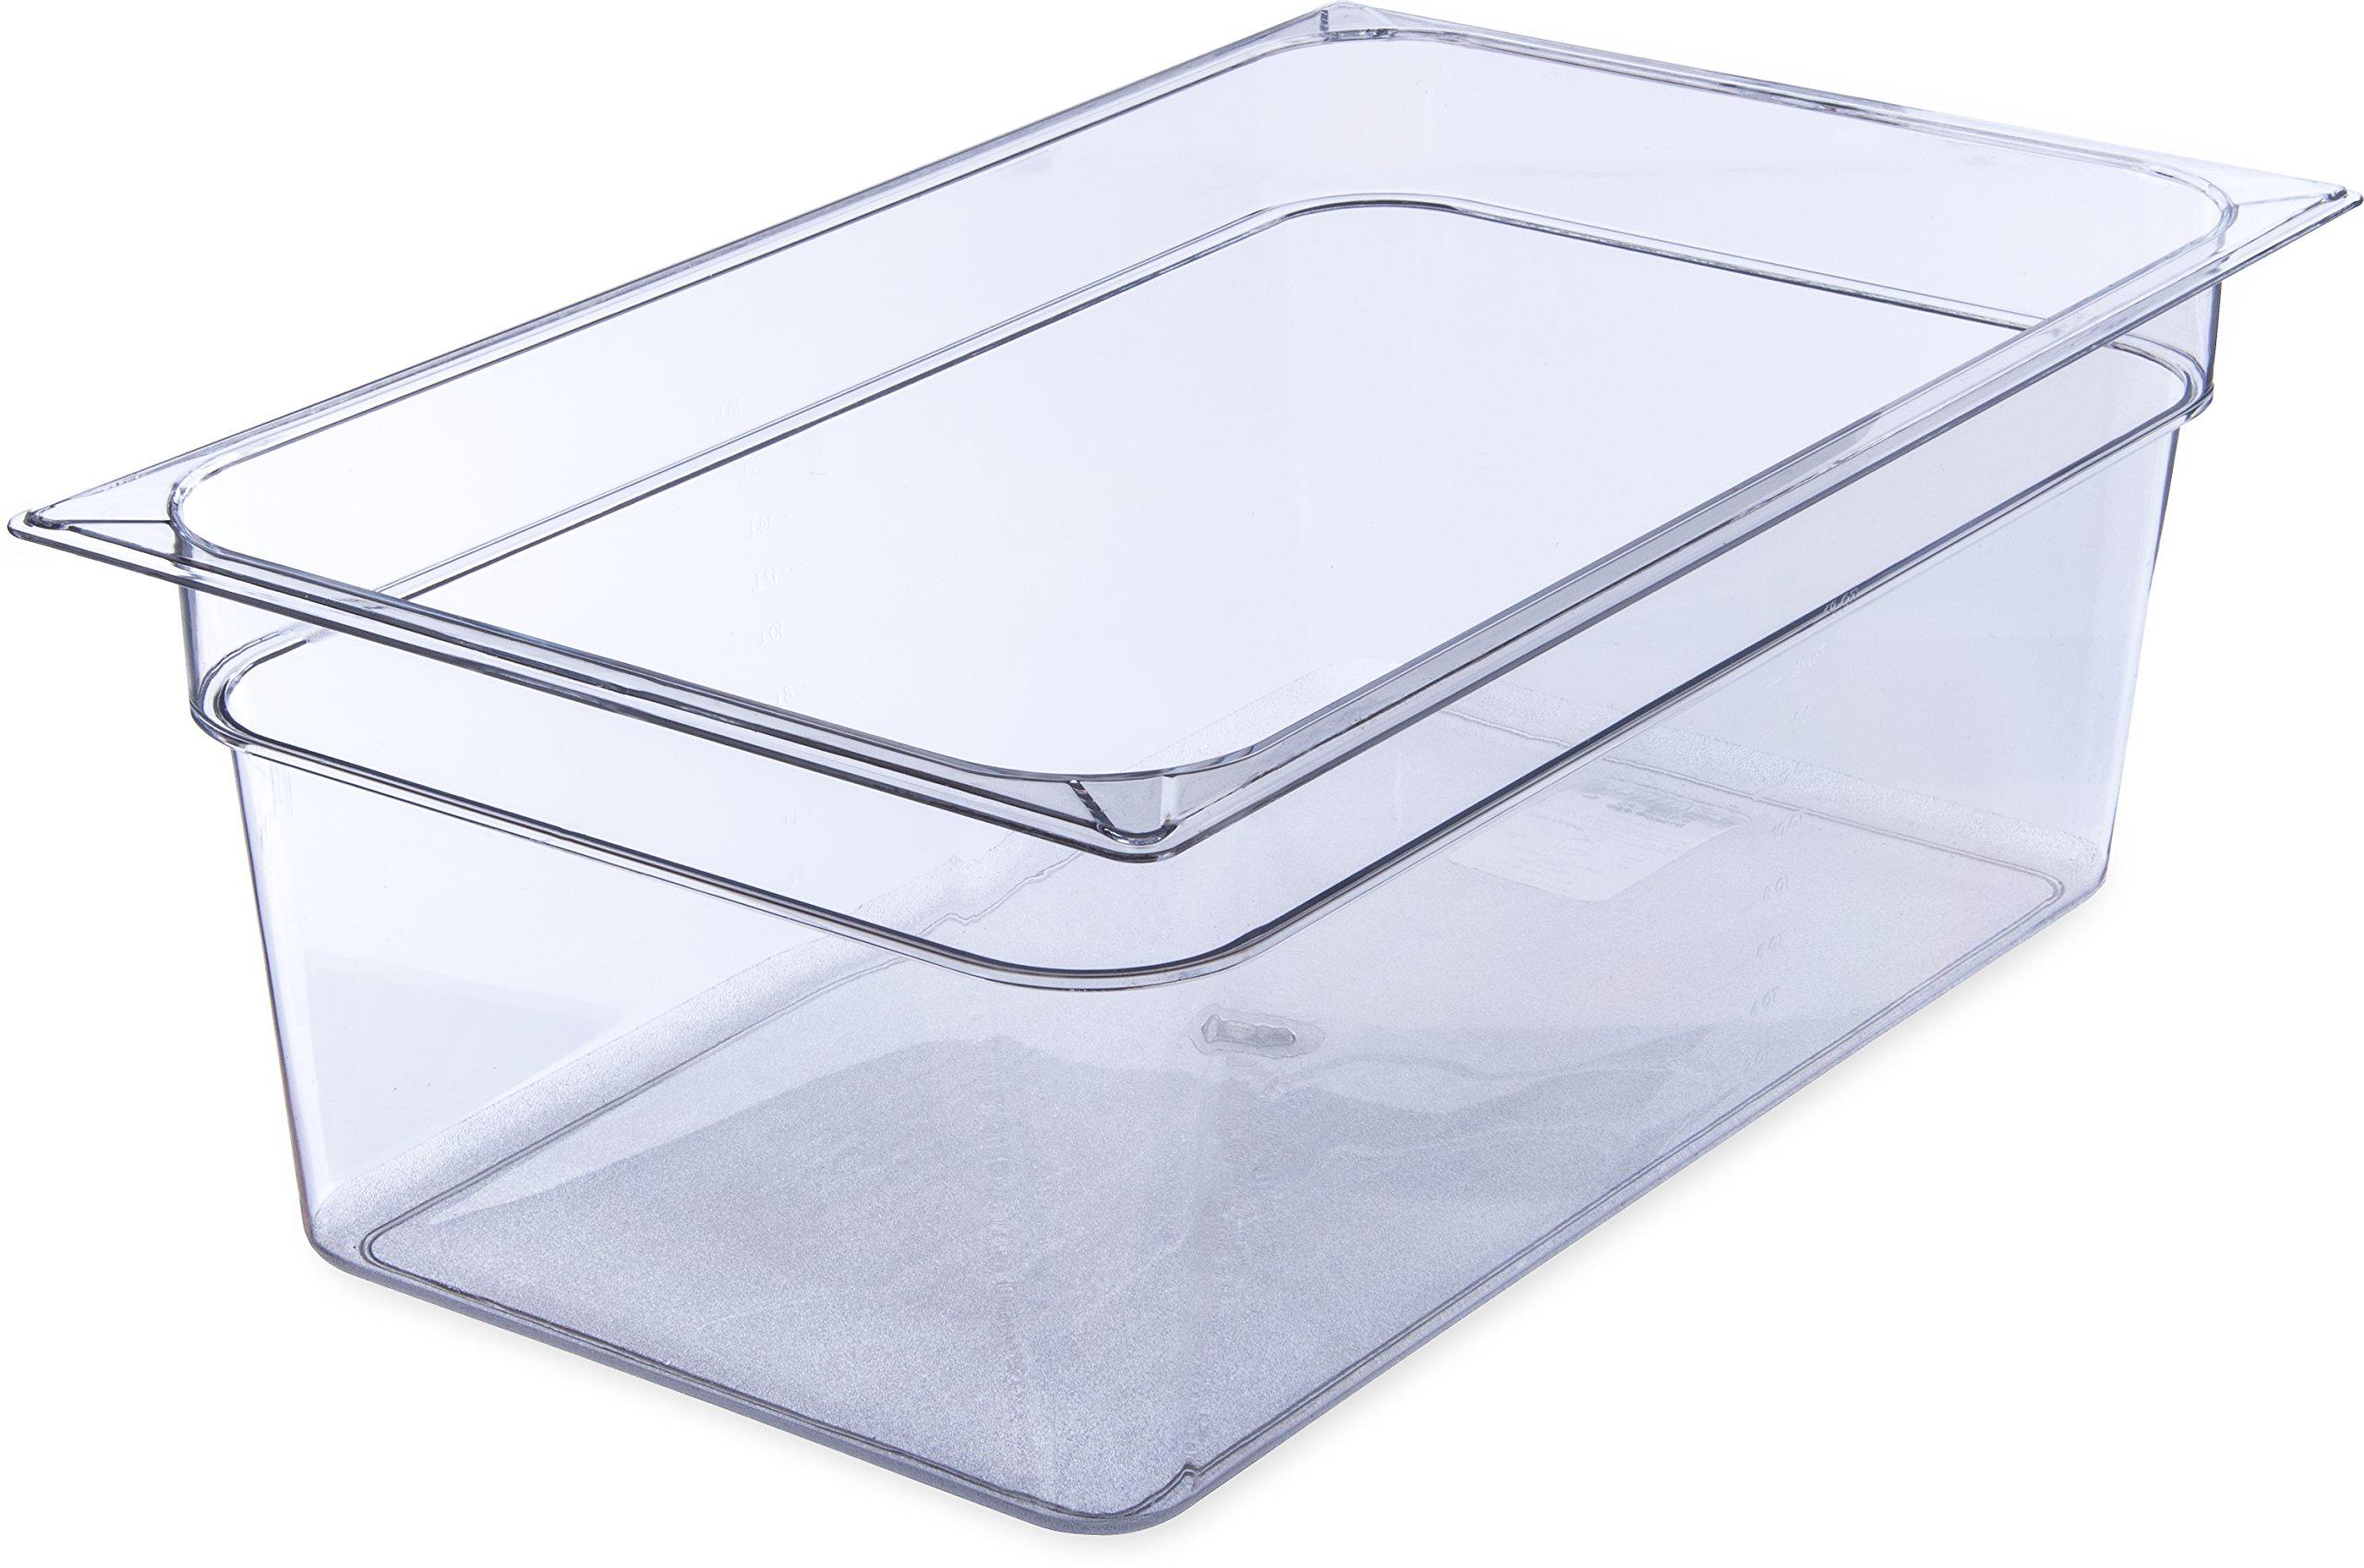 Carlisle 10203B07 StorPlus Full Size Polycarbonate Food Pan, 8'' Deep, Clear